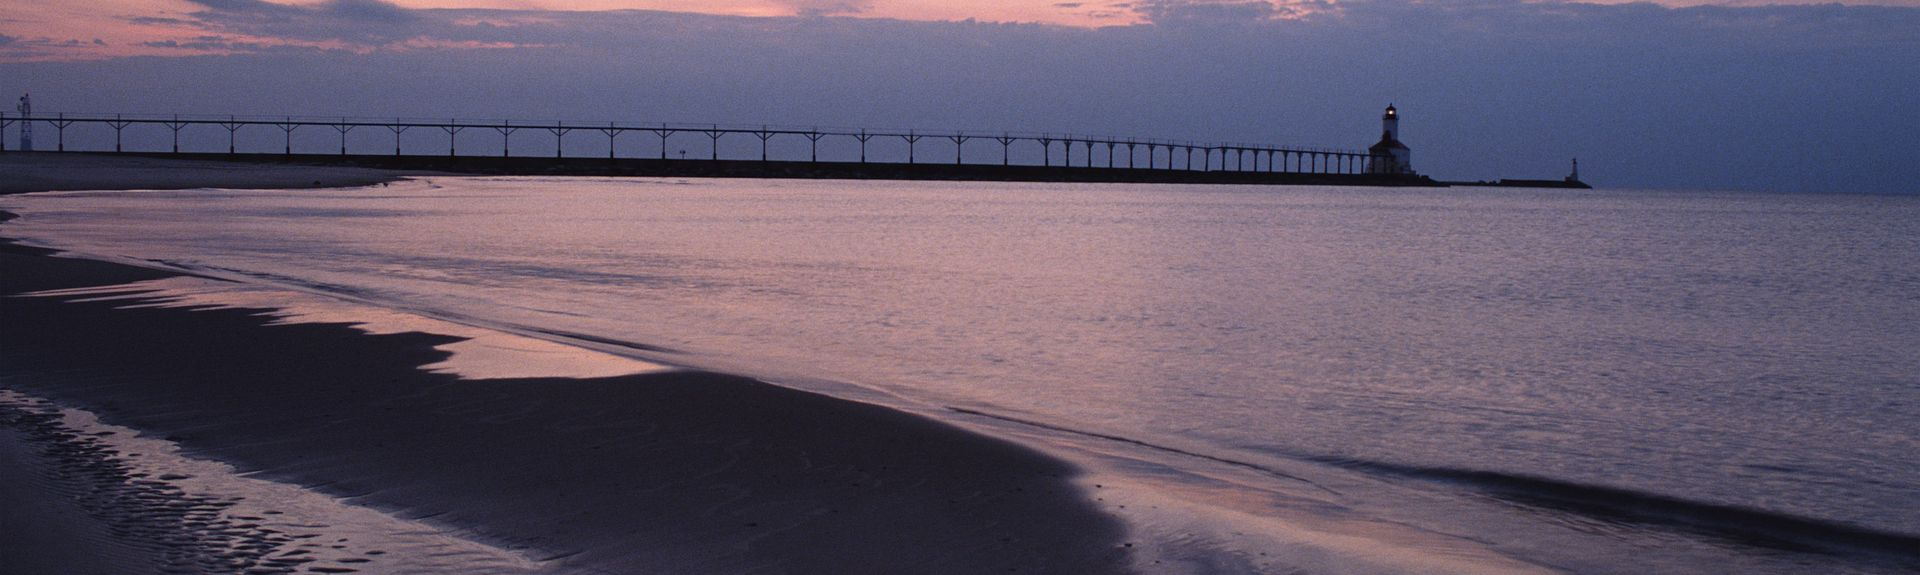 Union Pier, Michigan, United States of America